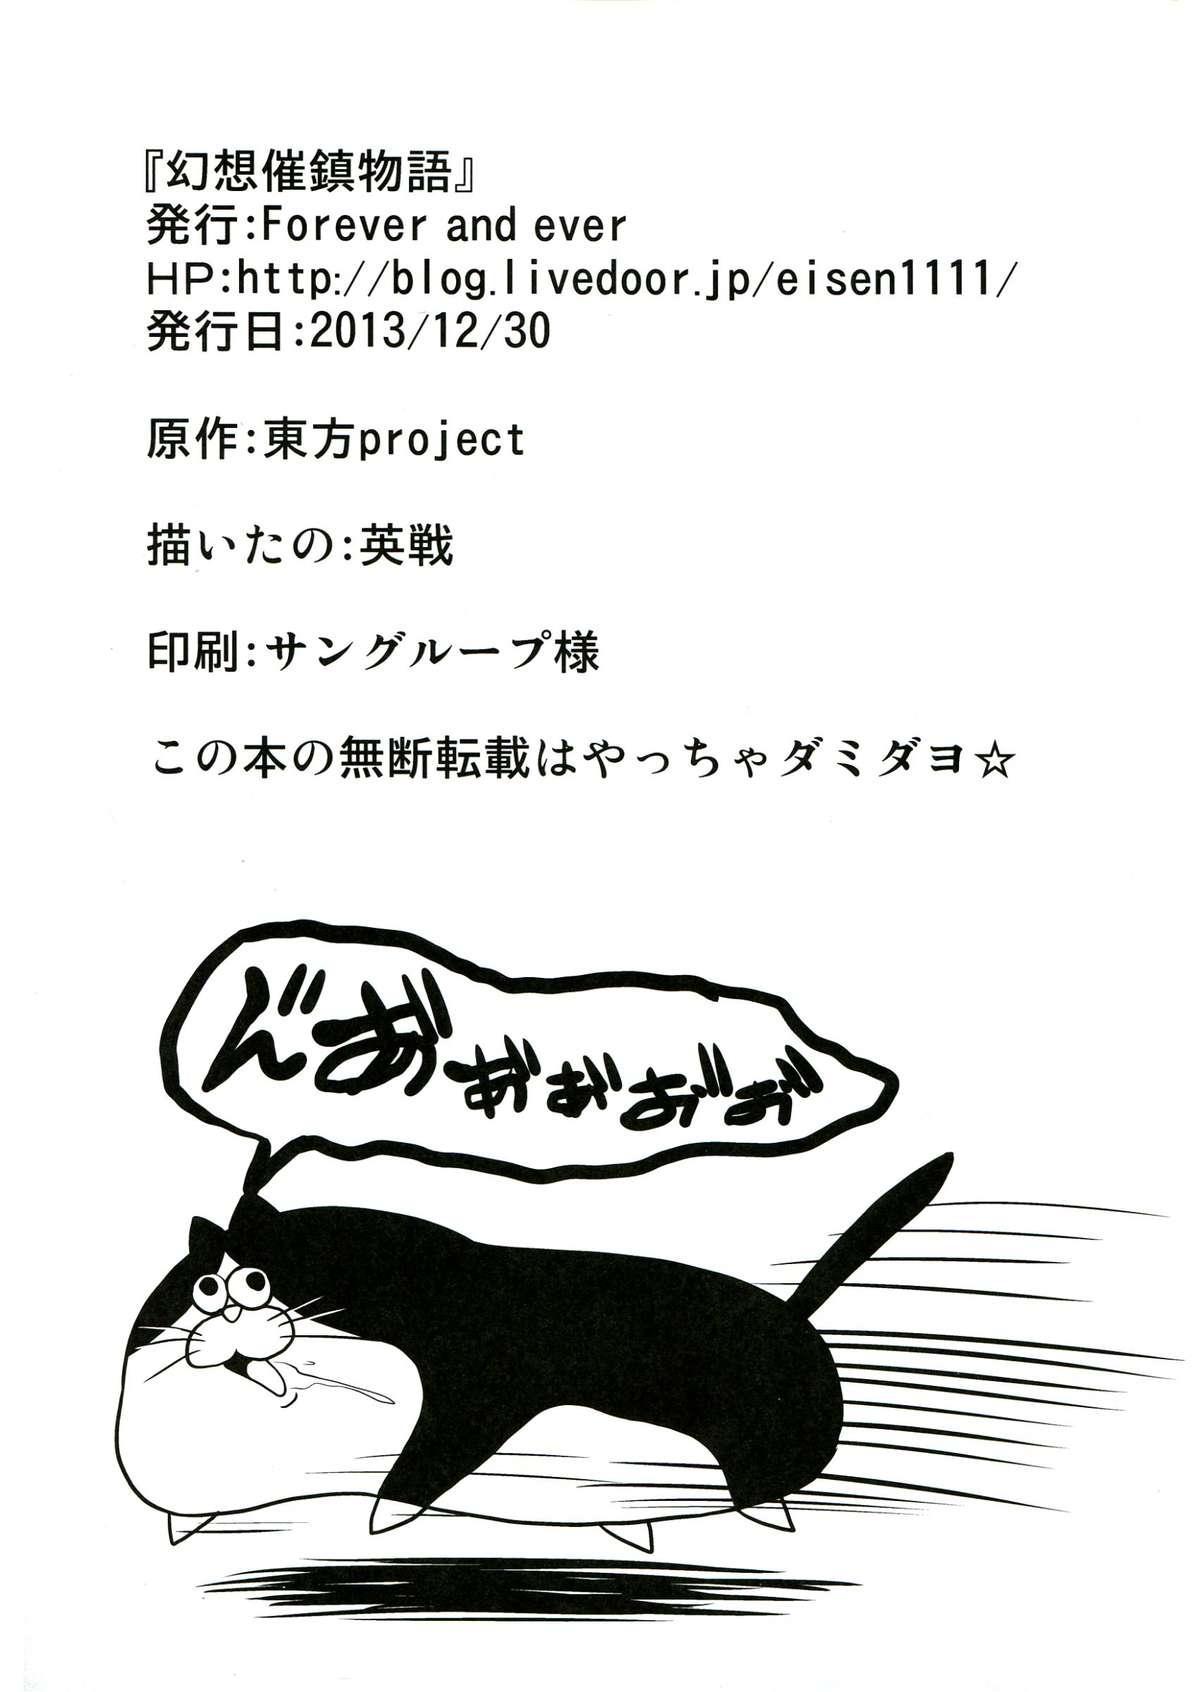 Gensou Saichin Monogatari 25